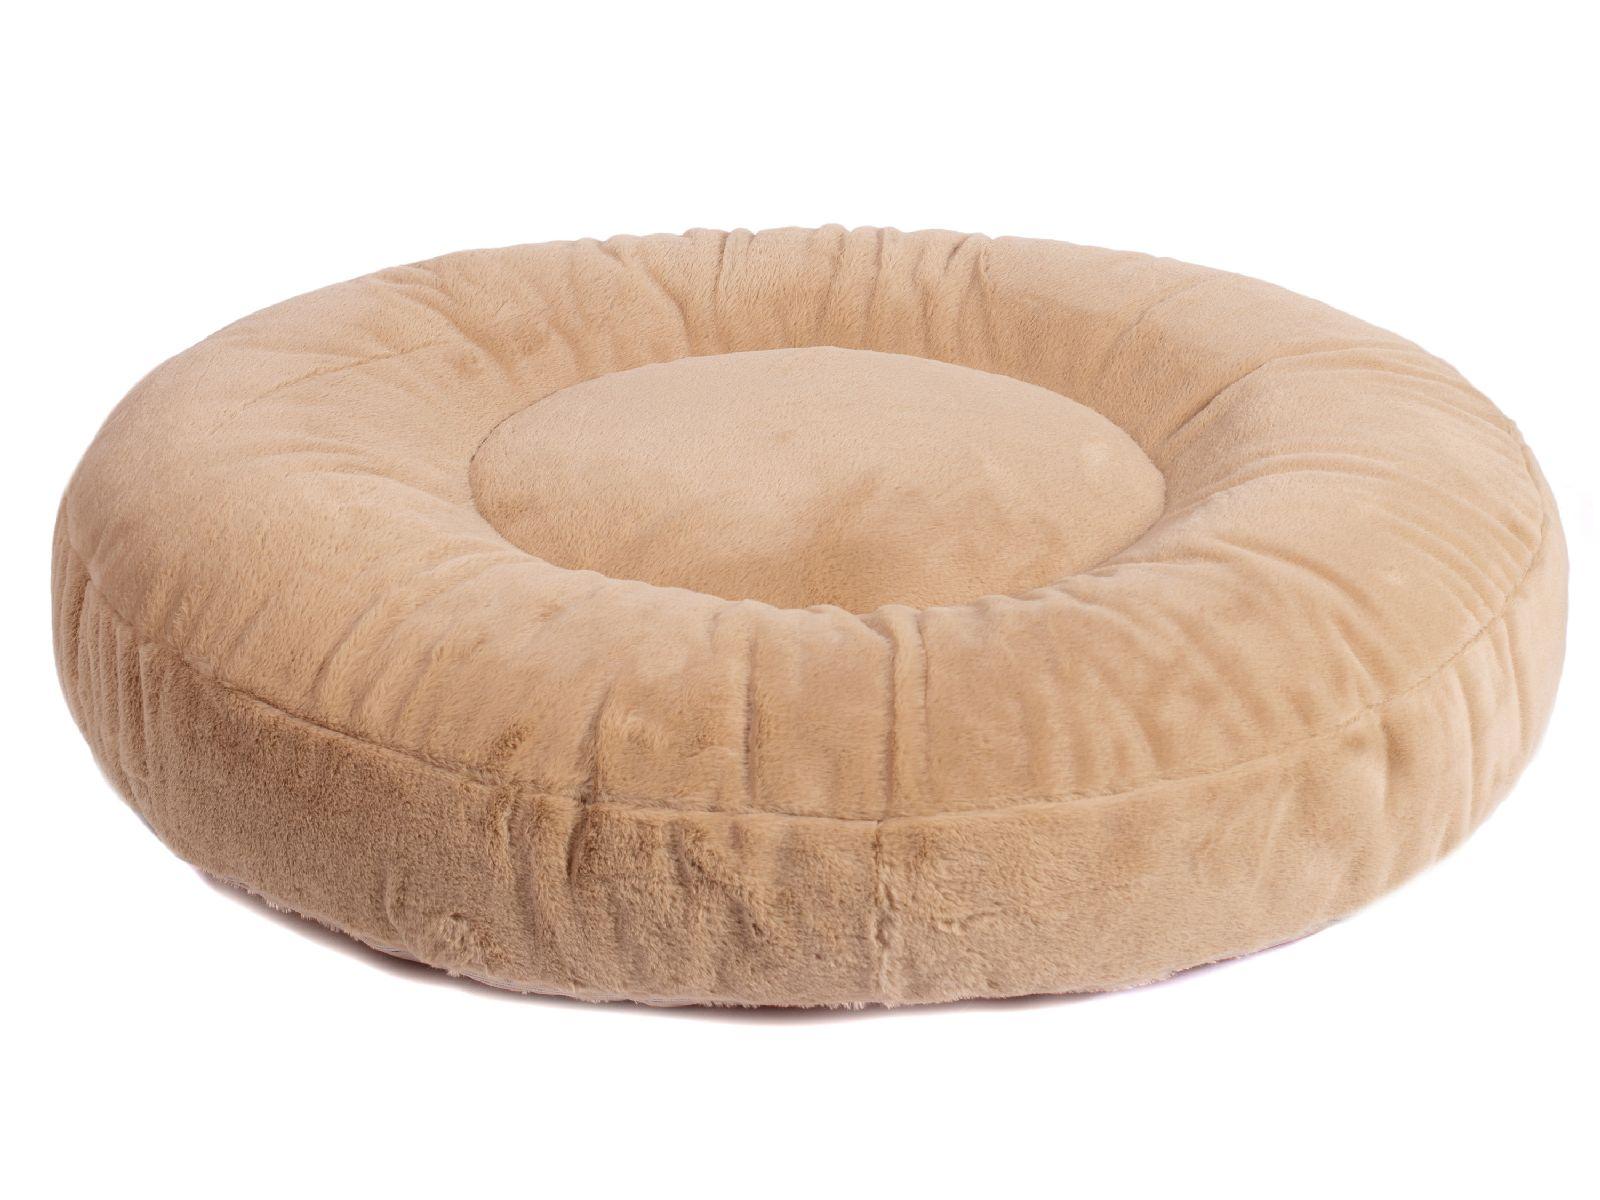 Wau-Donut Sand C